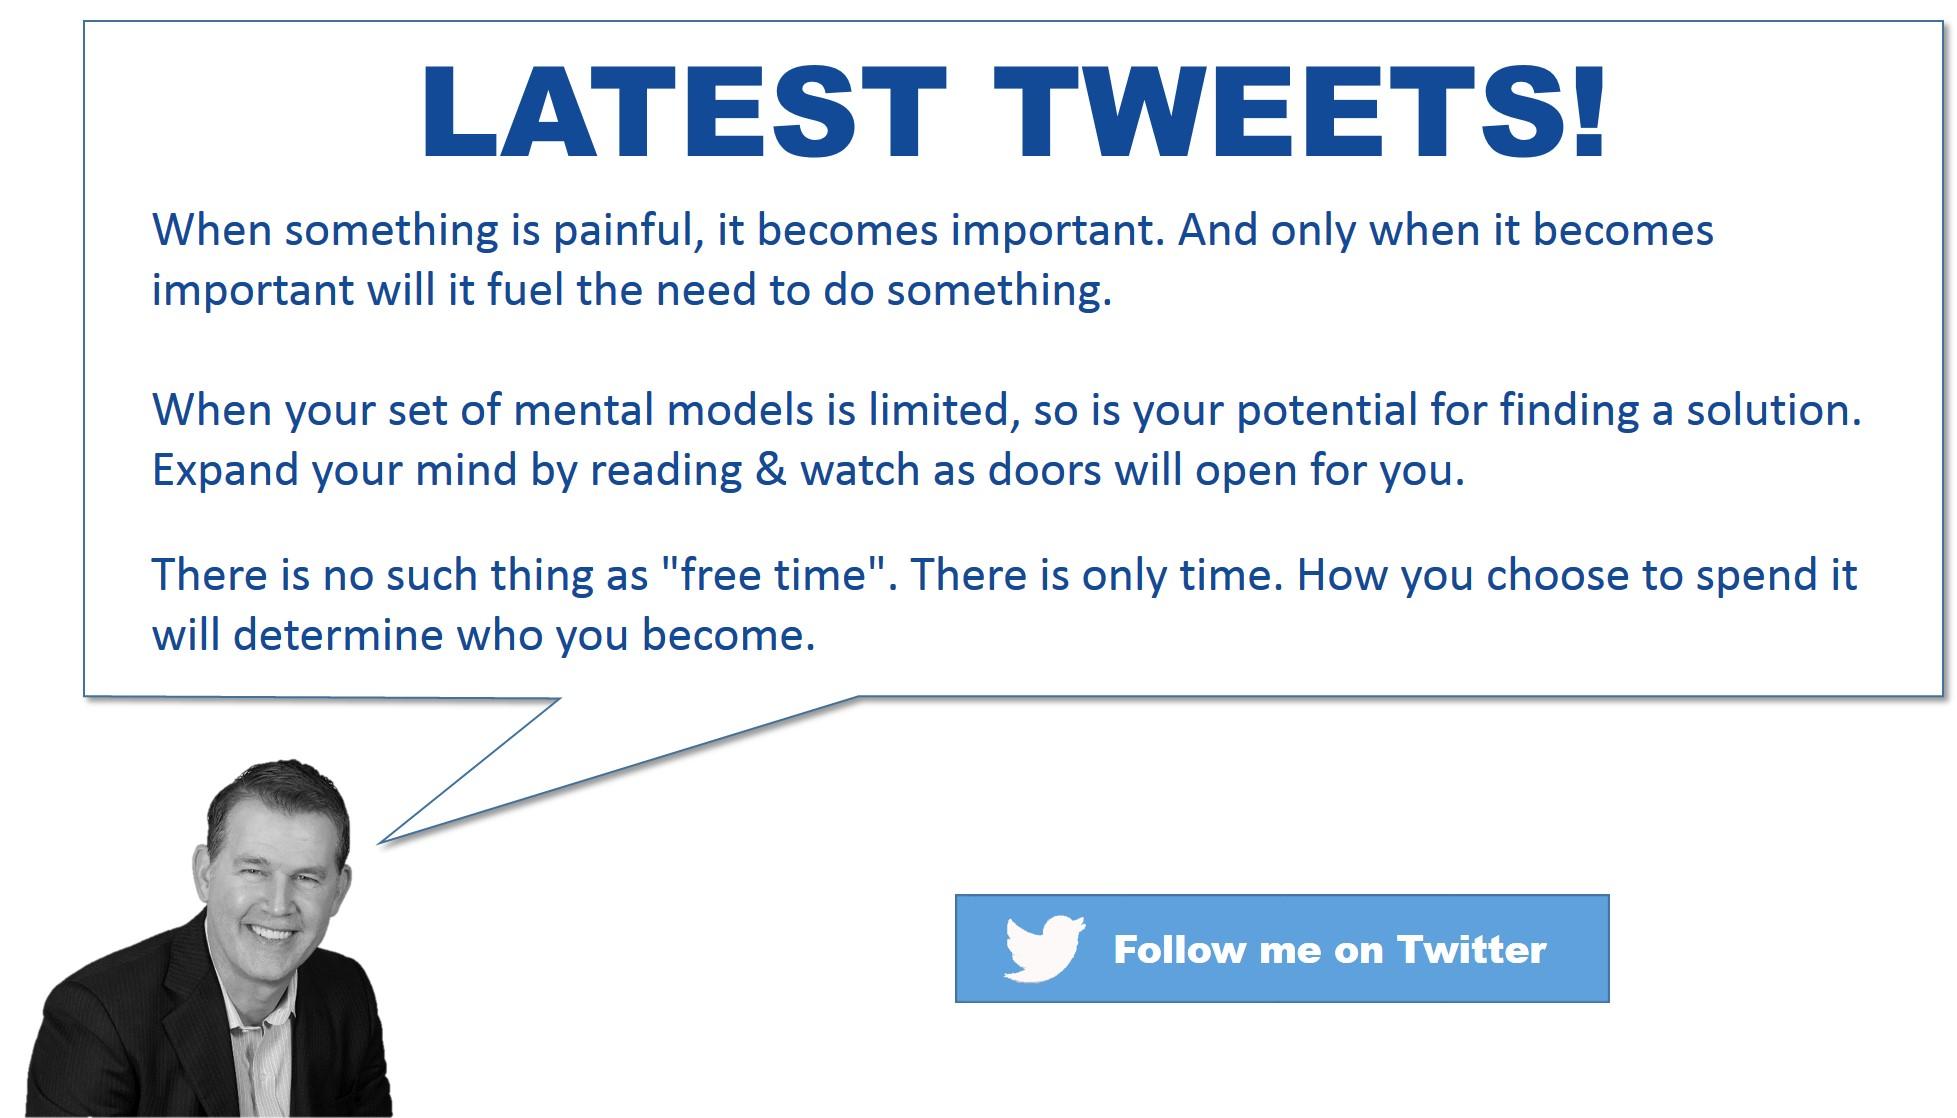 MontyCampbell-Tweets-12-2-17